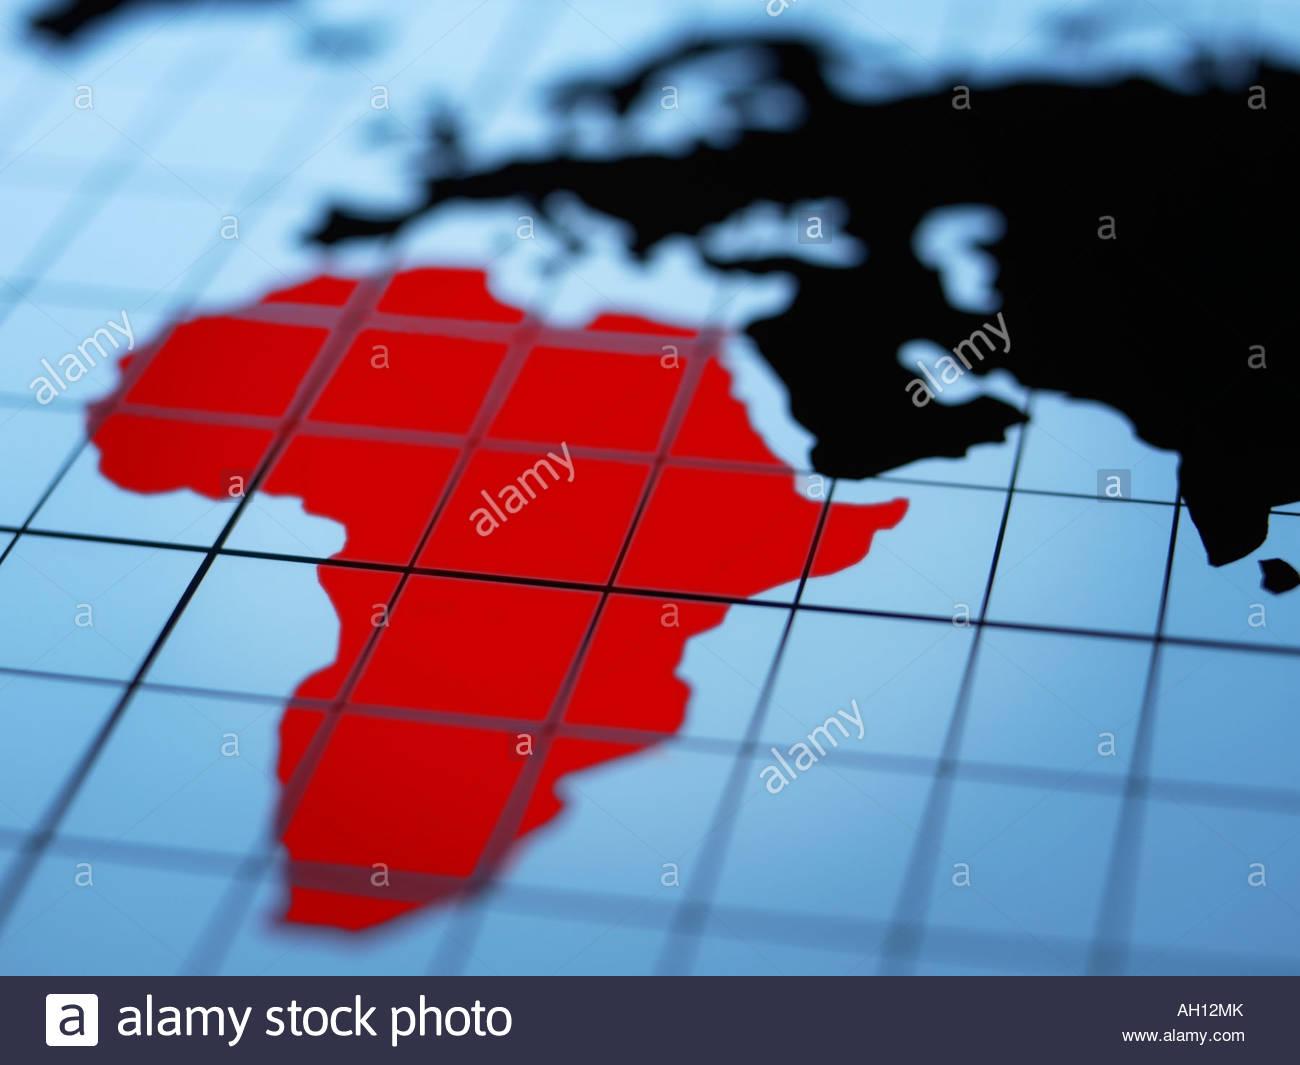 Map of eastern hemisphere highlighting Africa - Stock Image